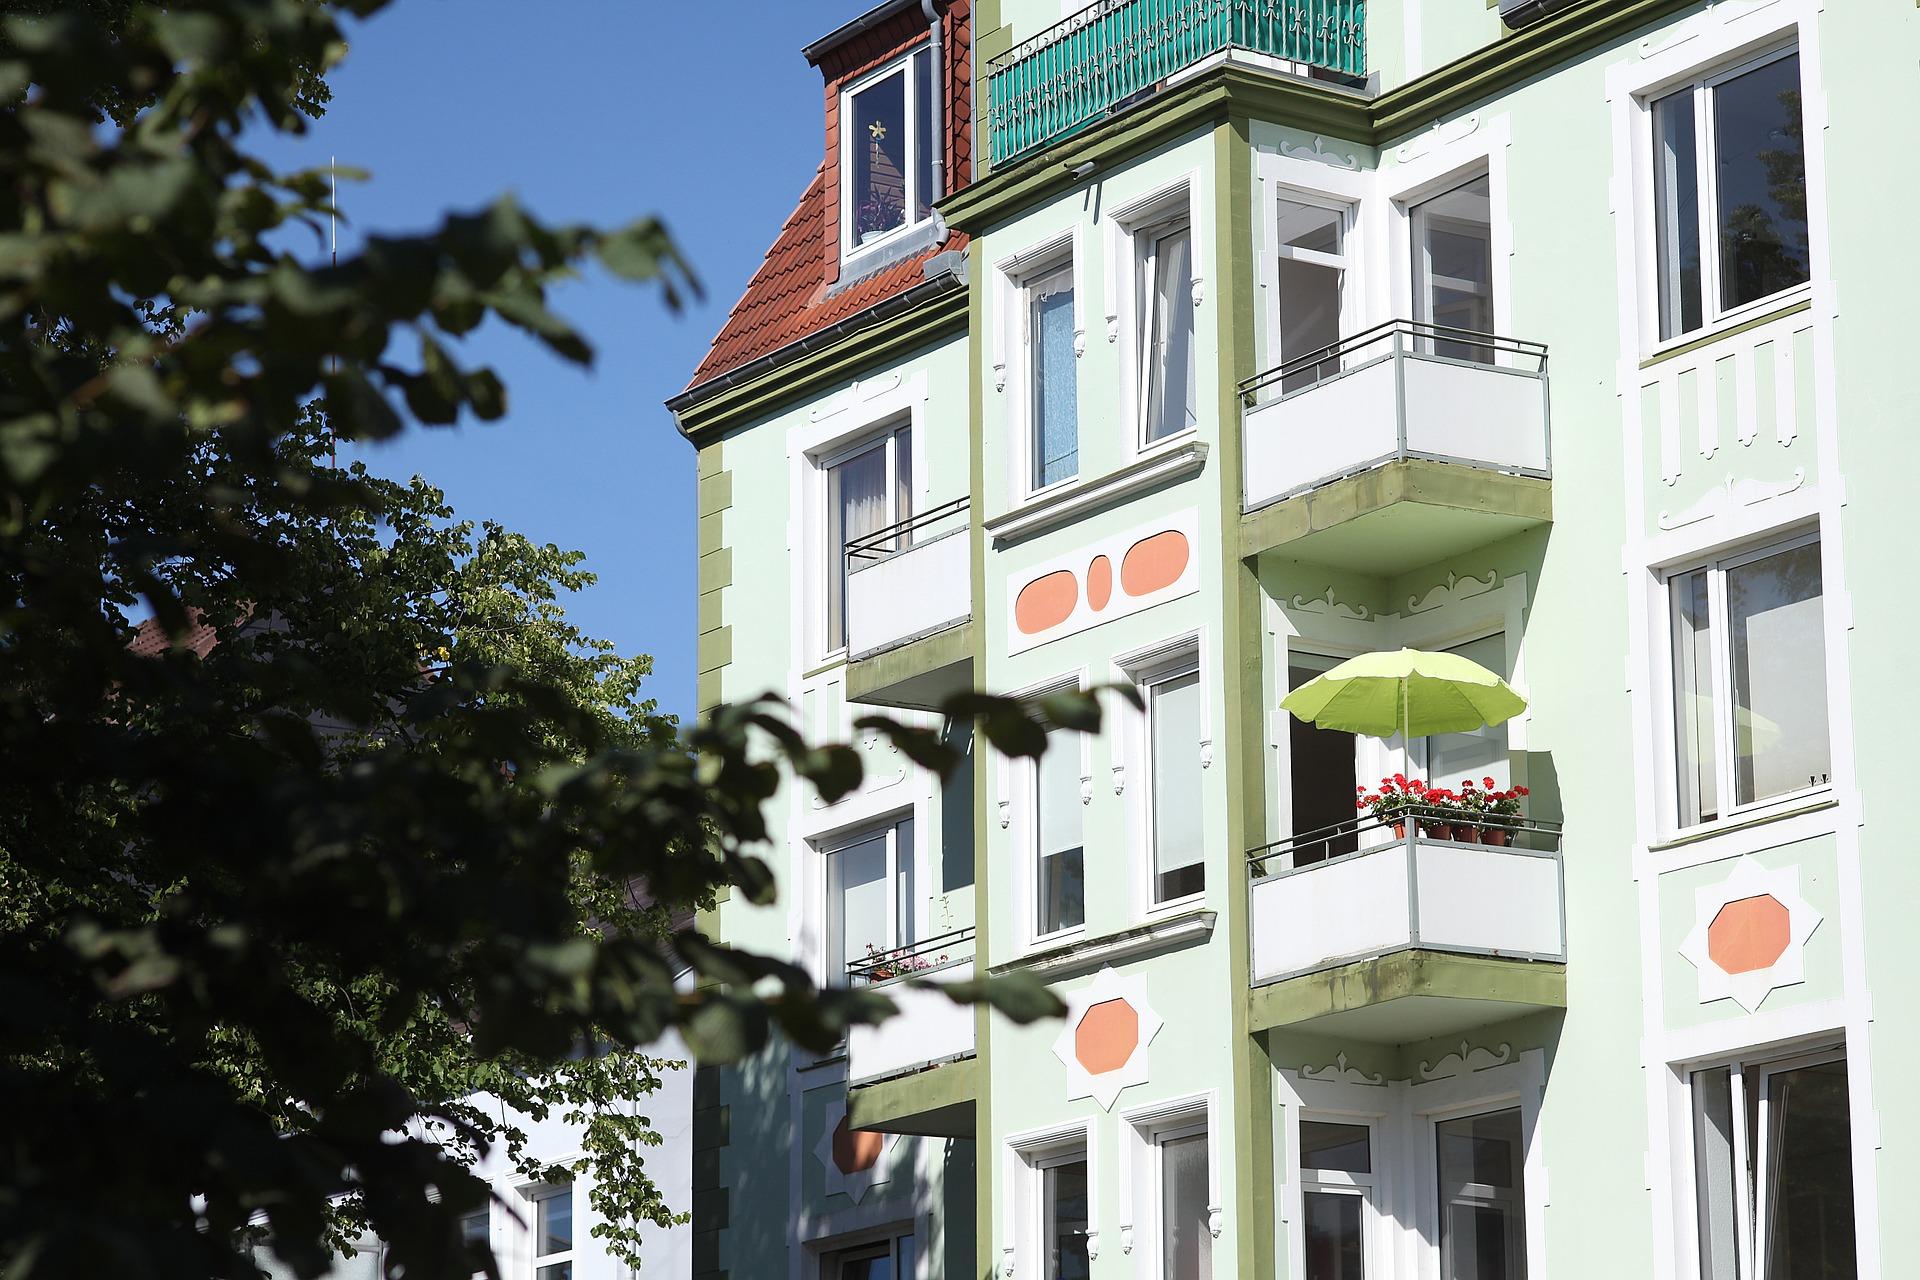 tenement-house-882149_1920